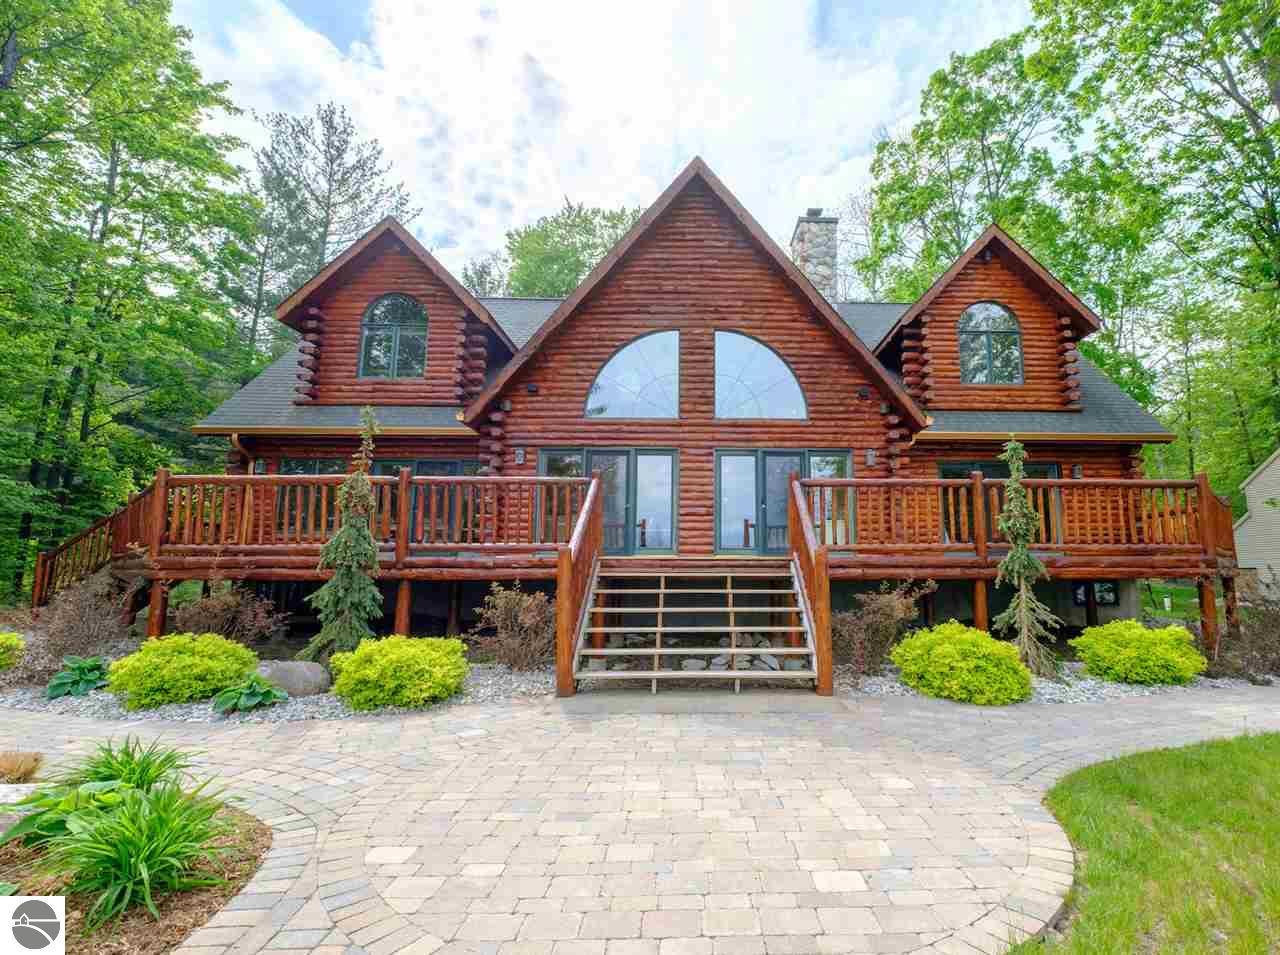 Michigan antrim county kewadin - 6869 Cottage Drive